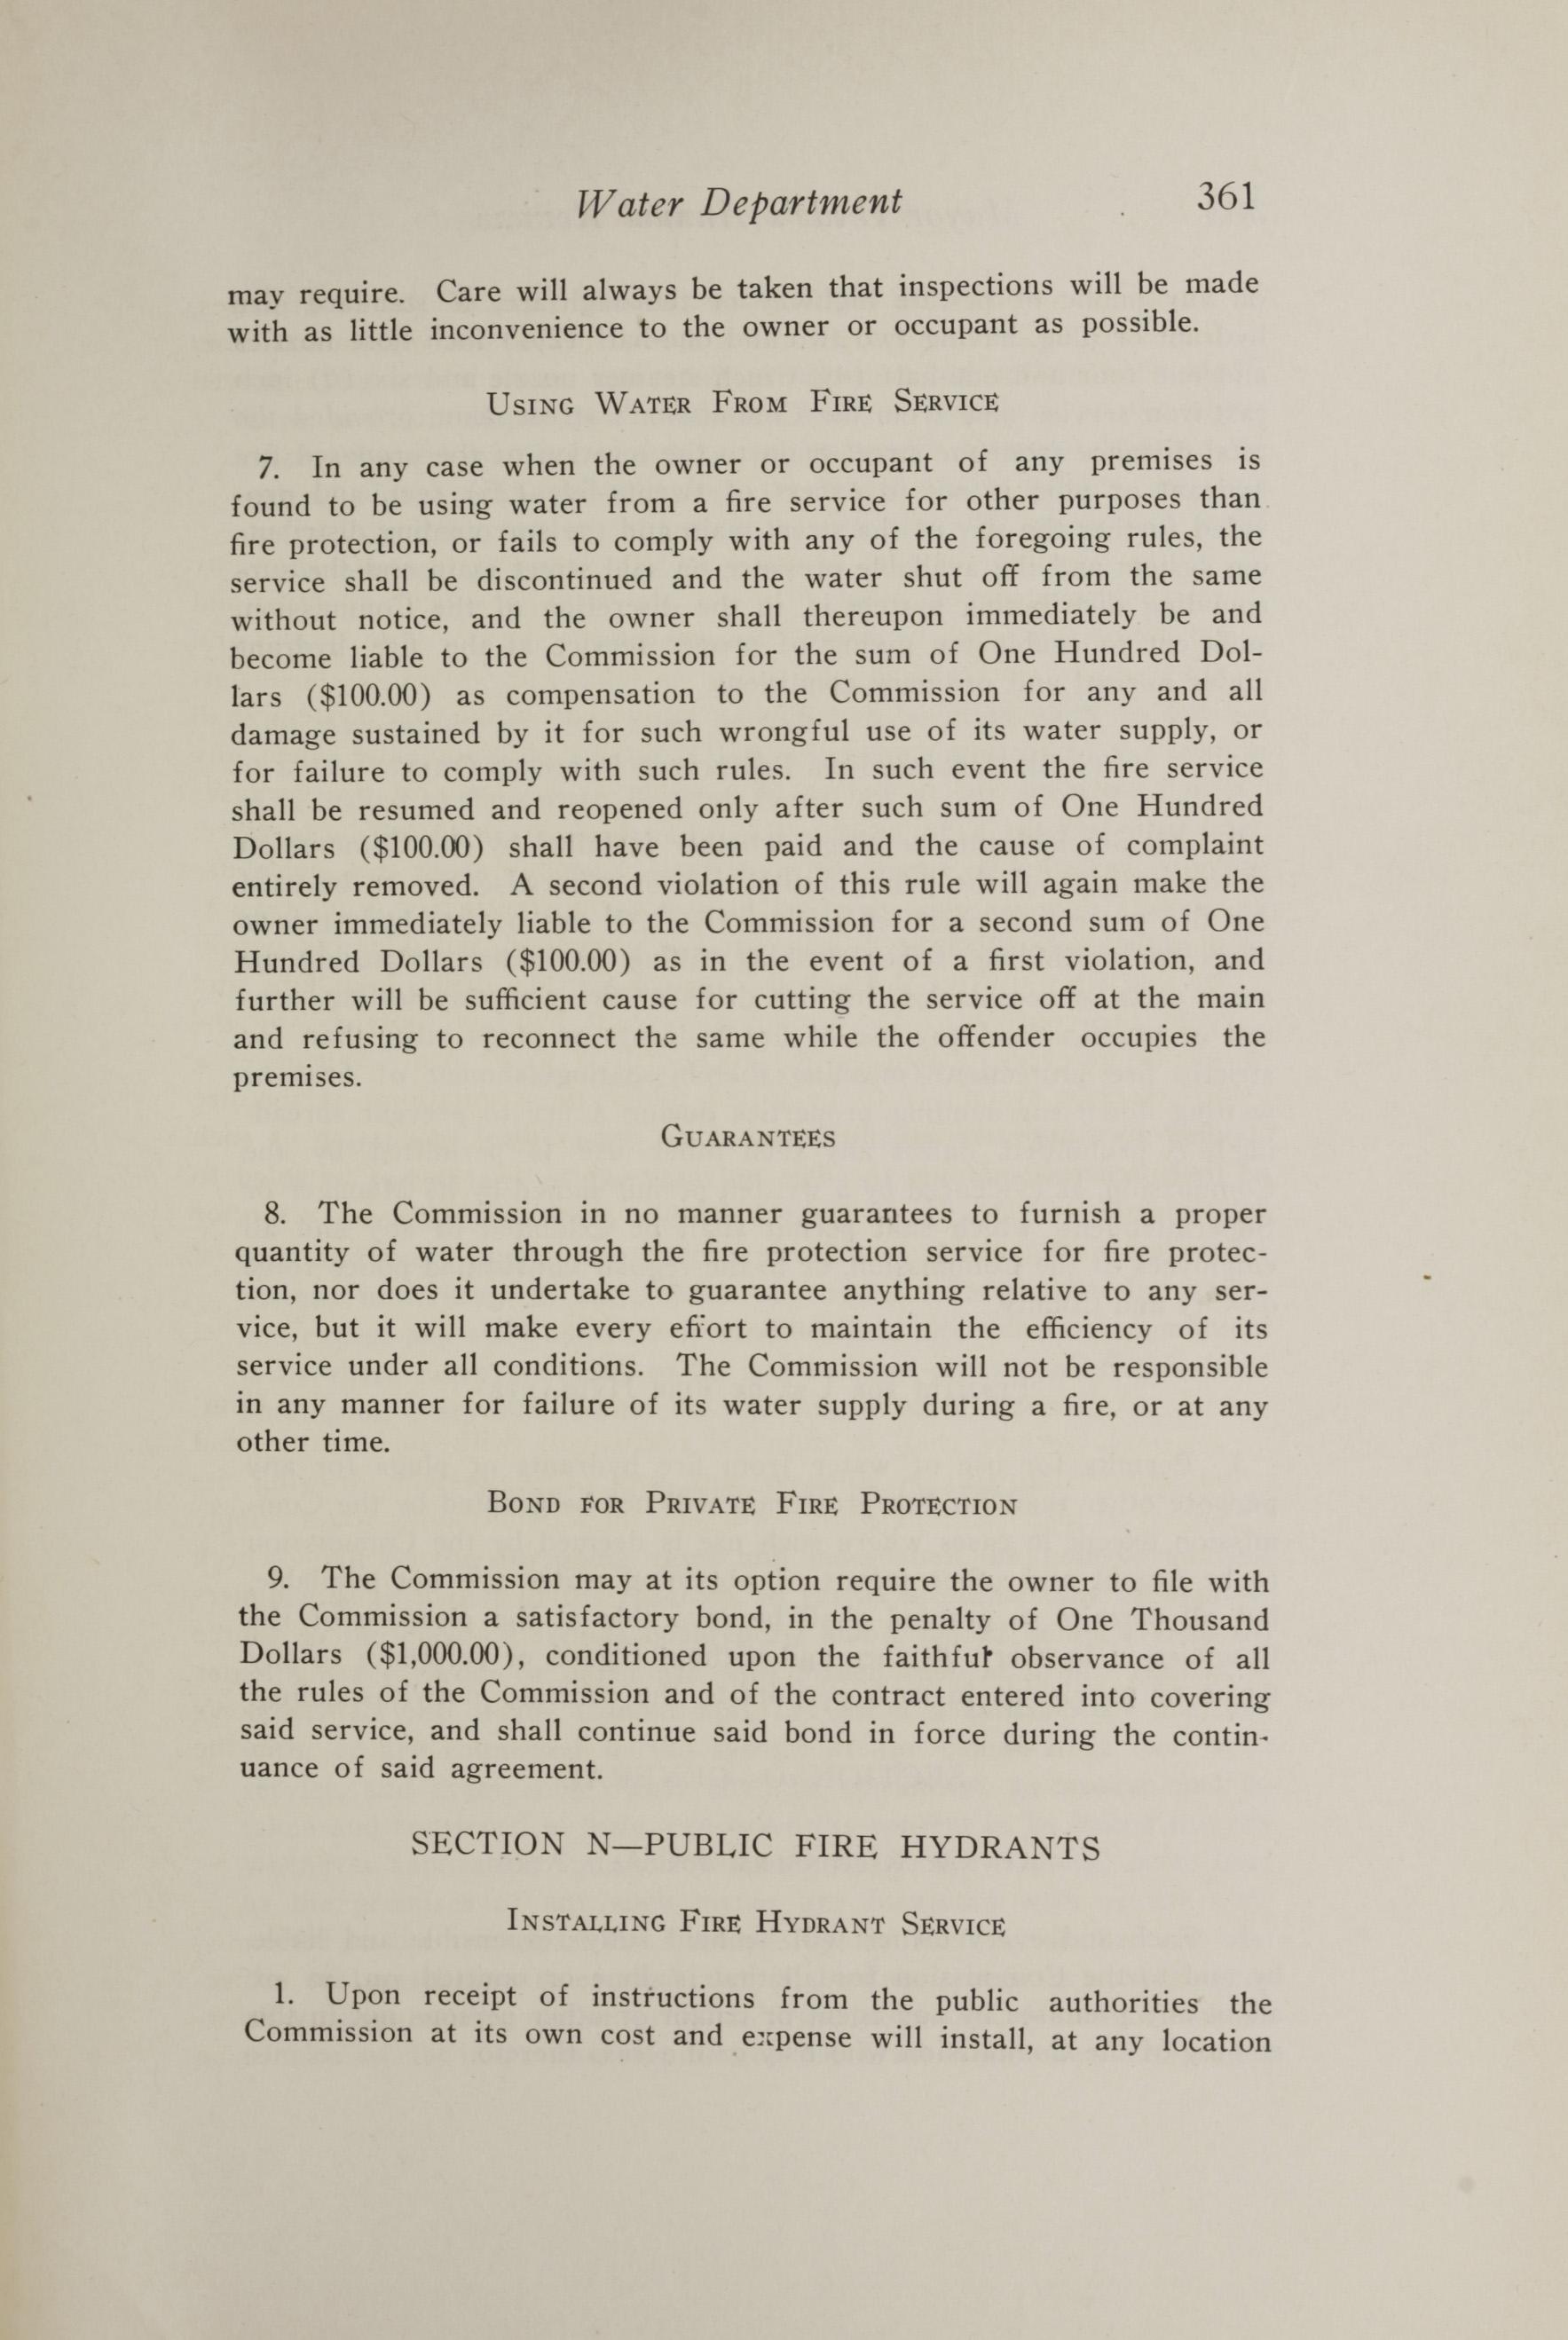 Charleston Yearbook, 1917, page 361